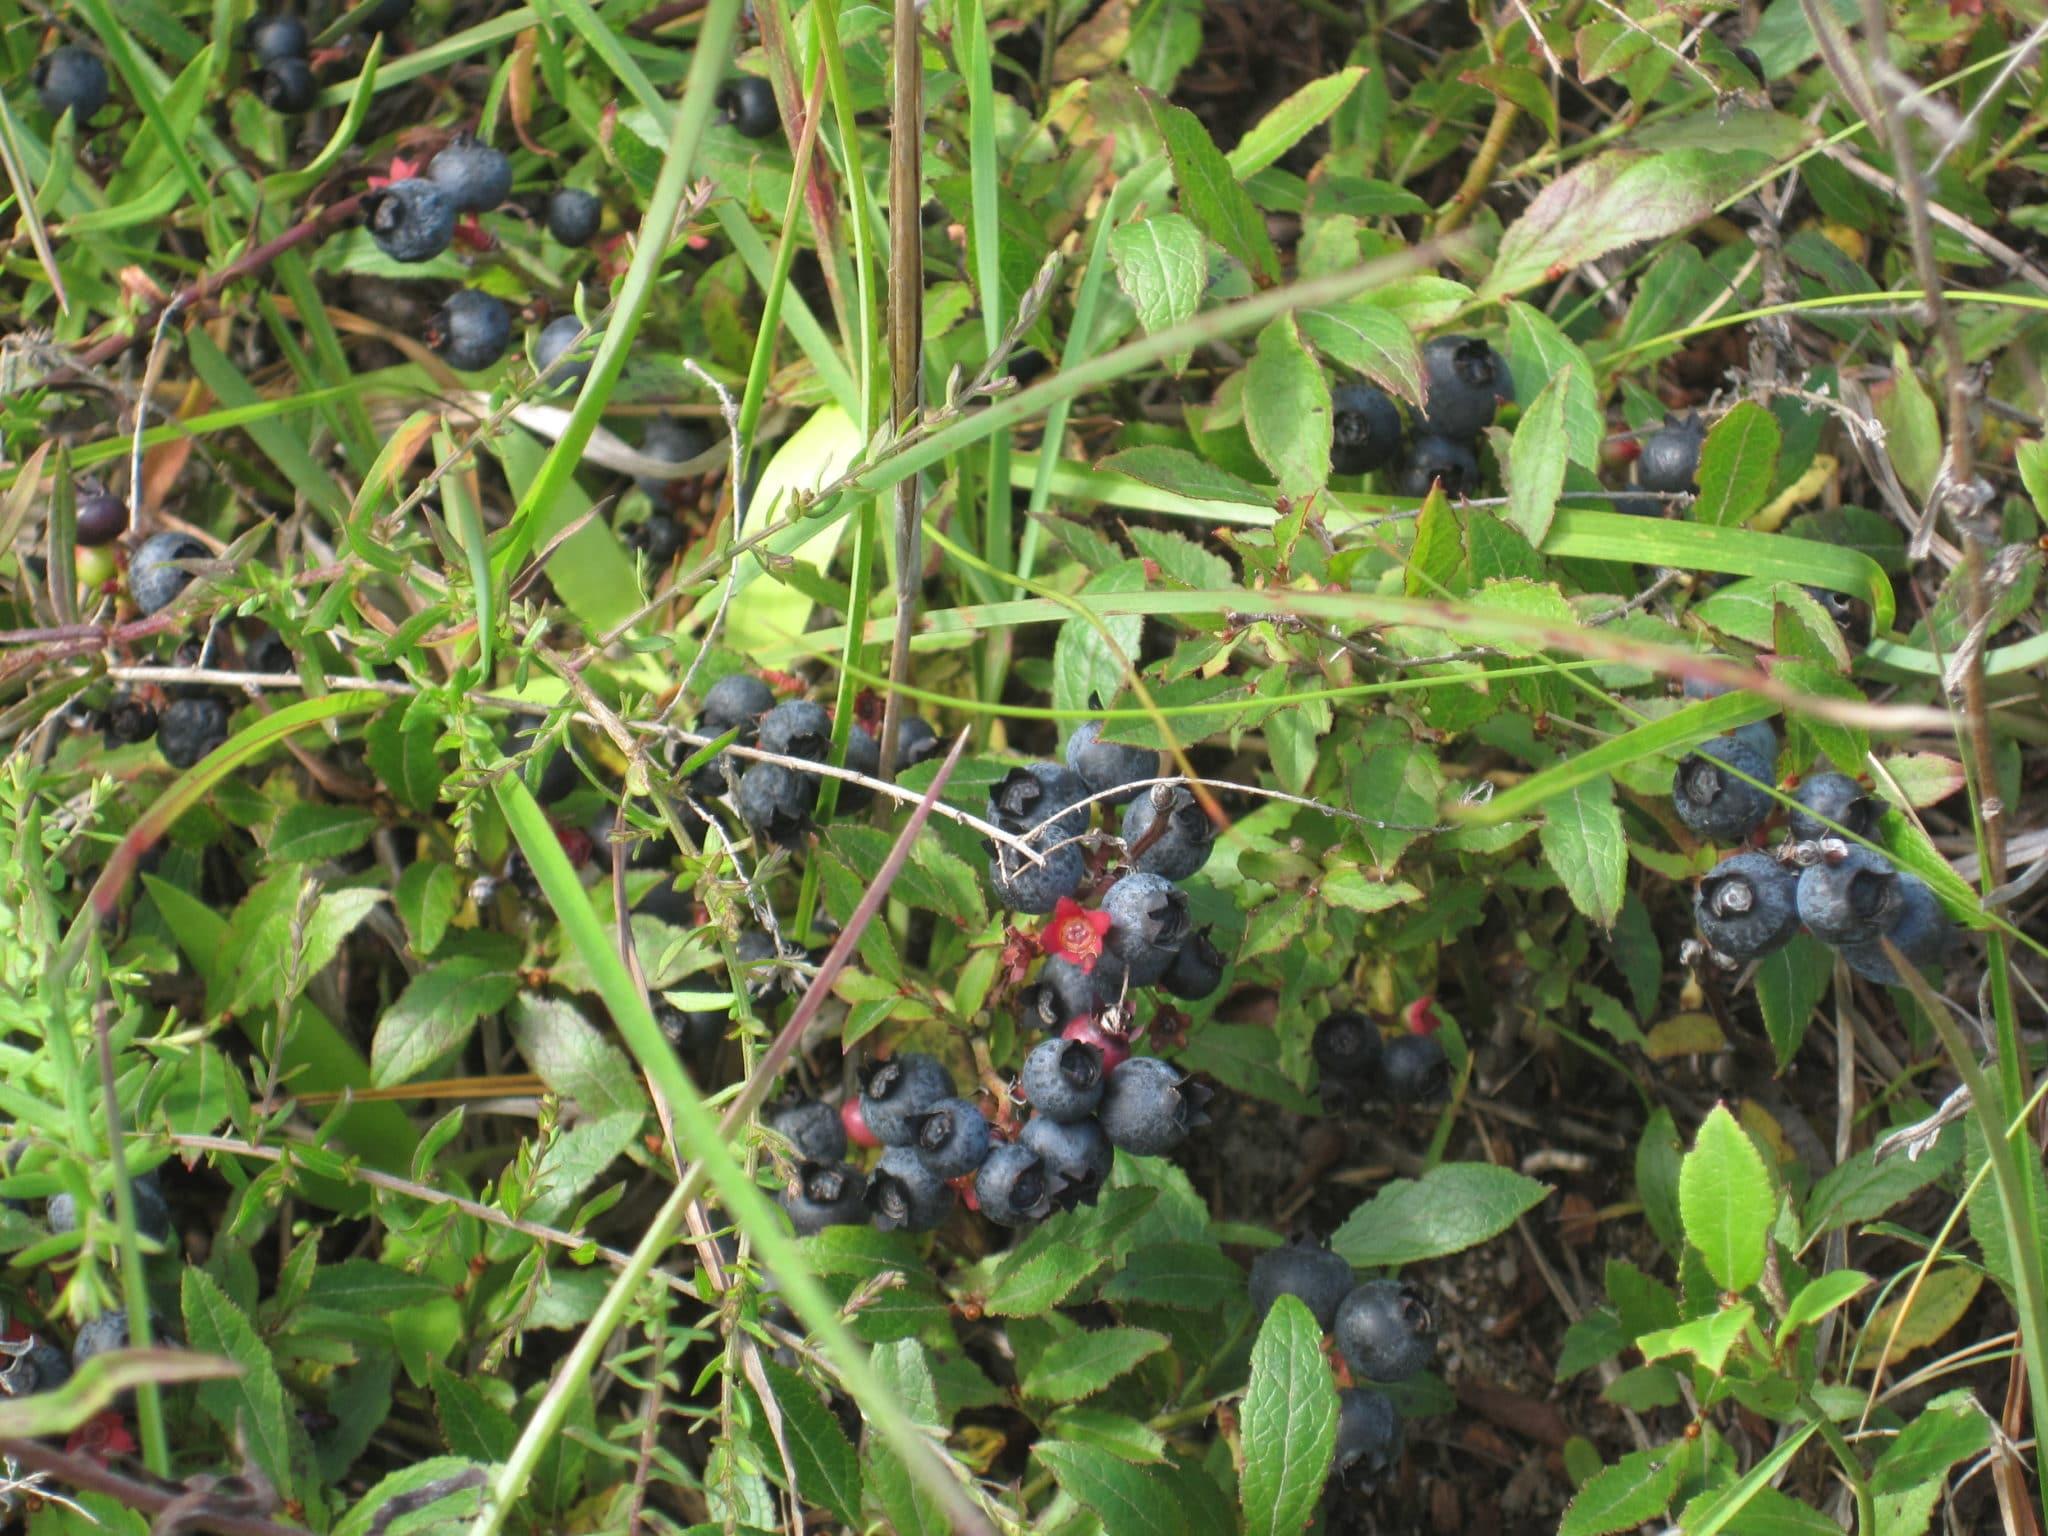 Common Lowbush Blueberry fruits by JPK